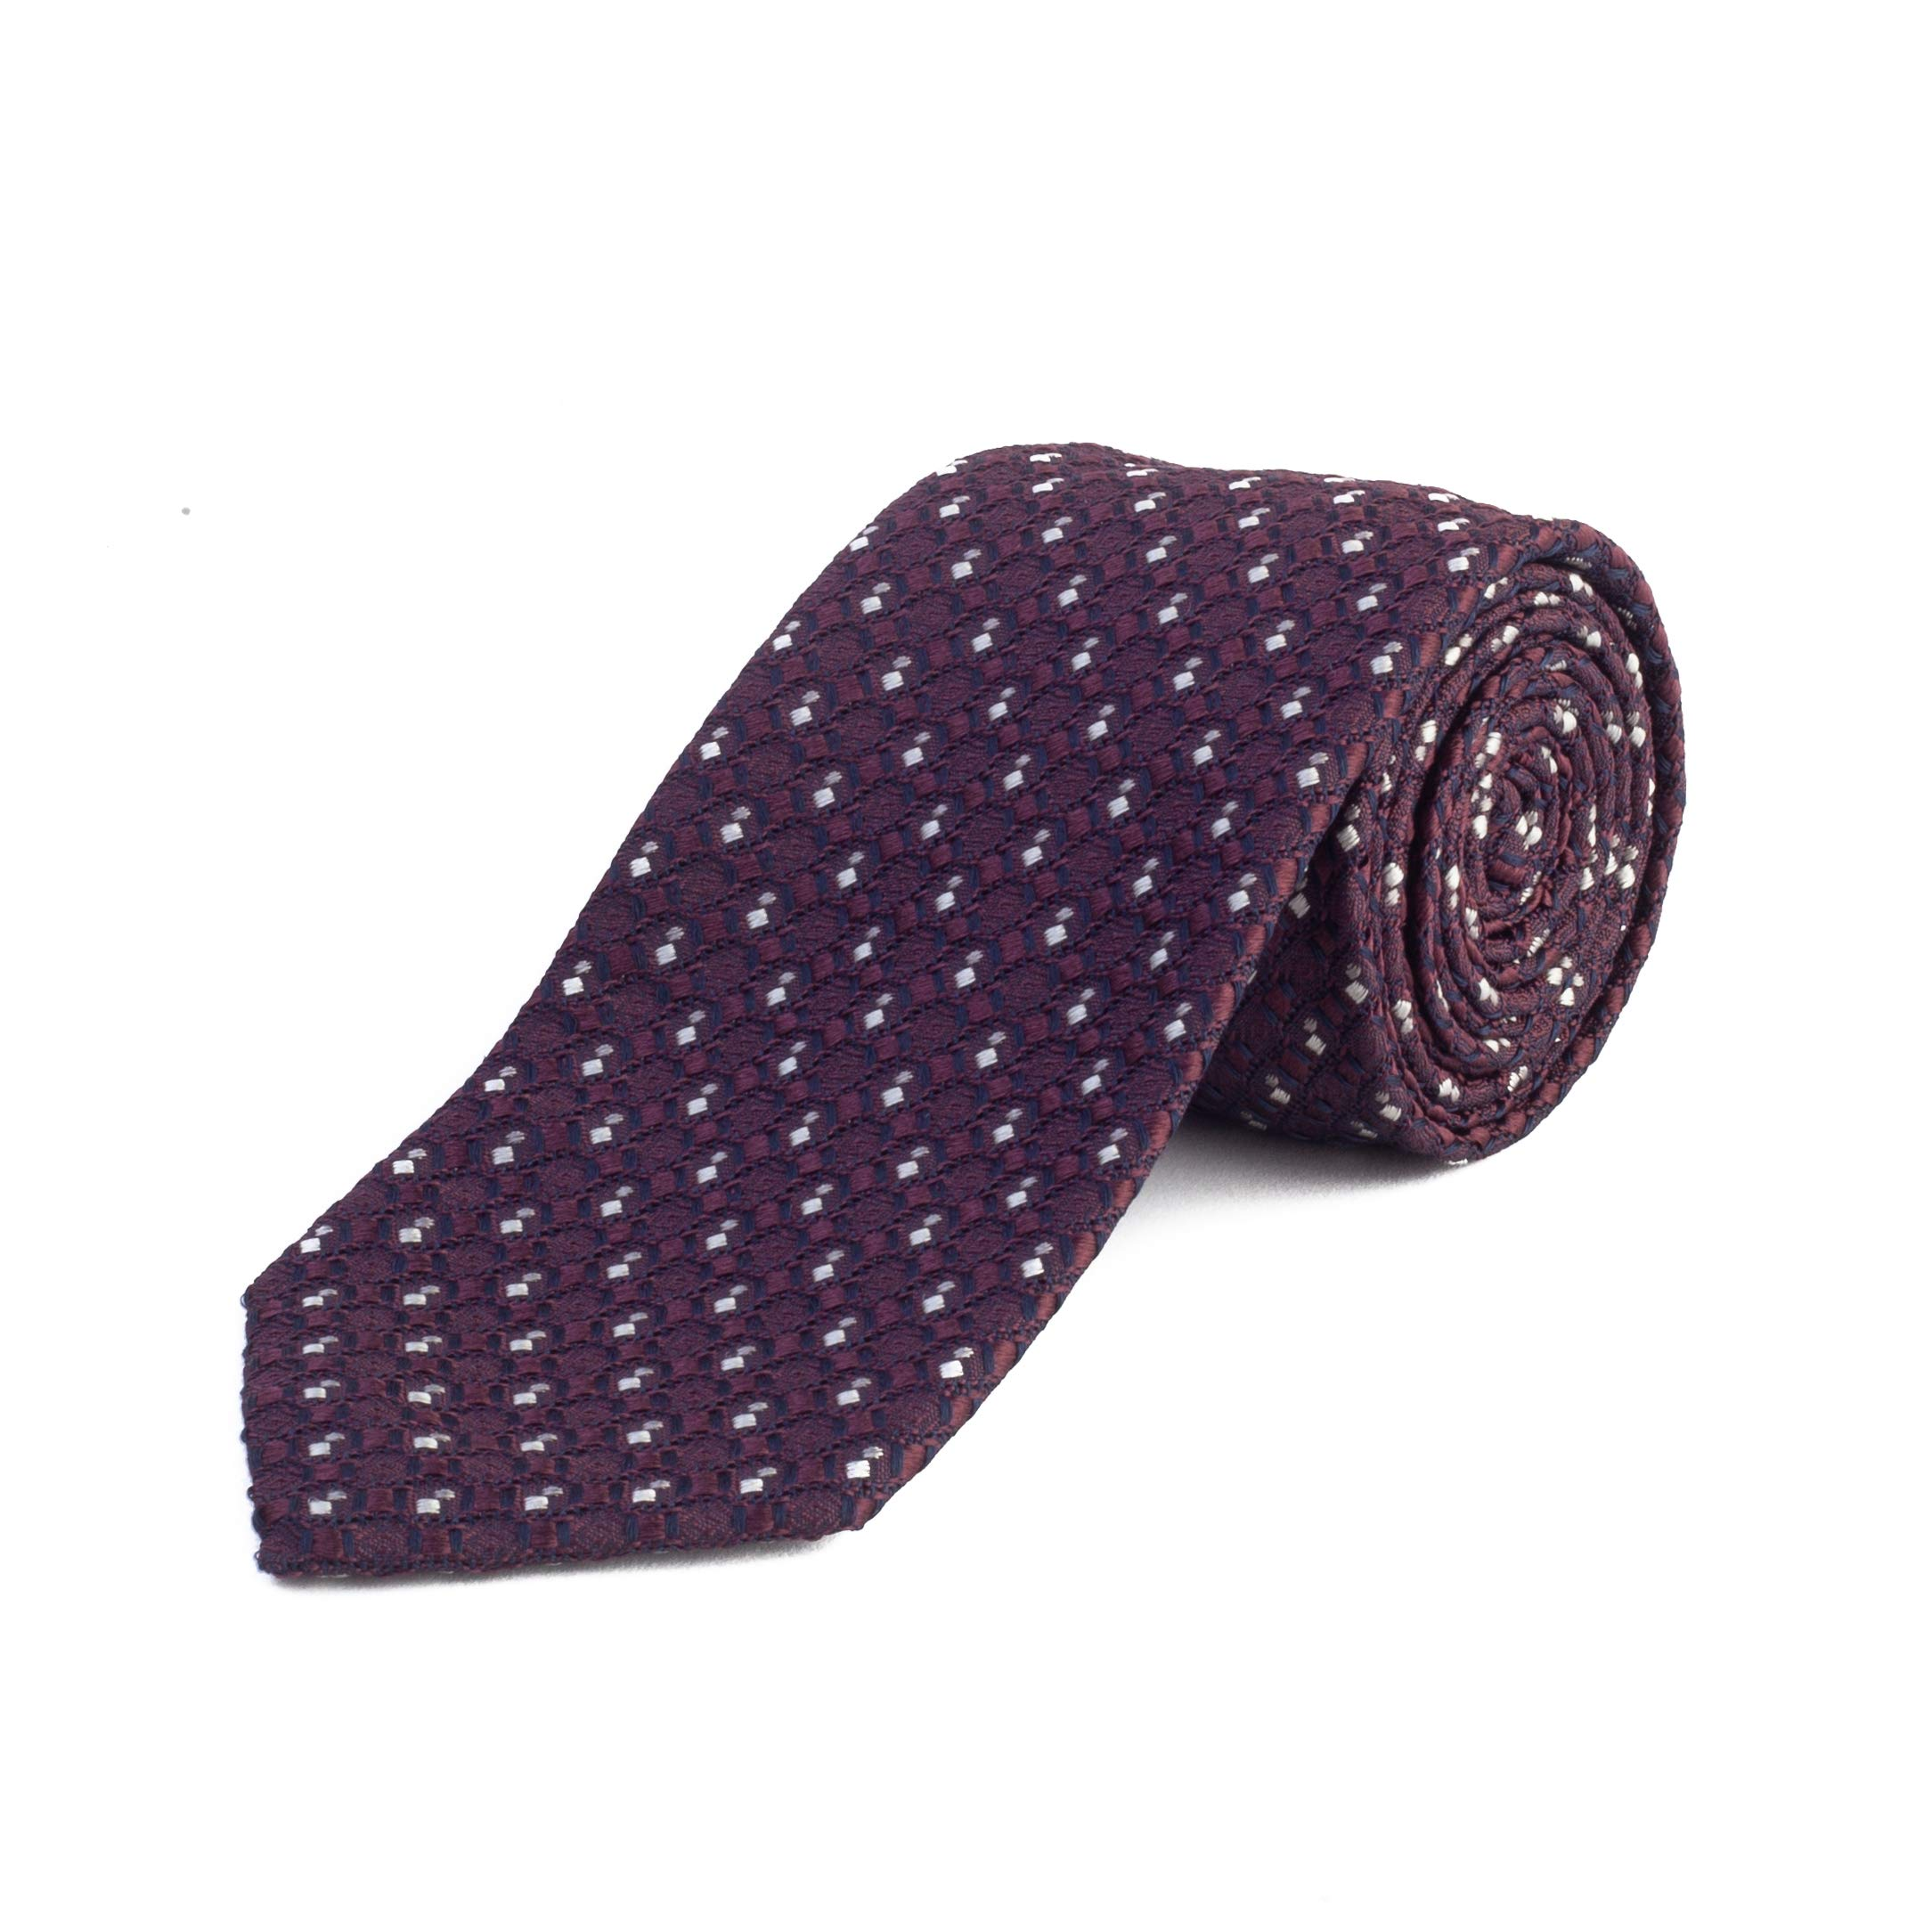 Ermenegildo Zegna Men's Silk Textured Patteren Tie Purple